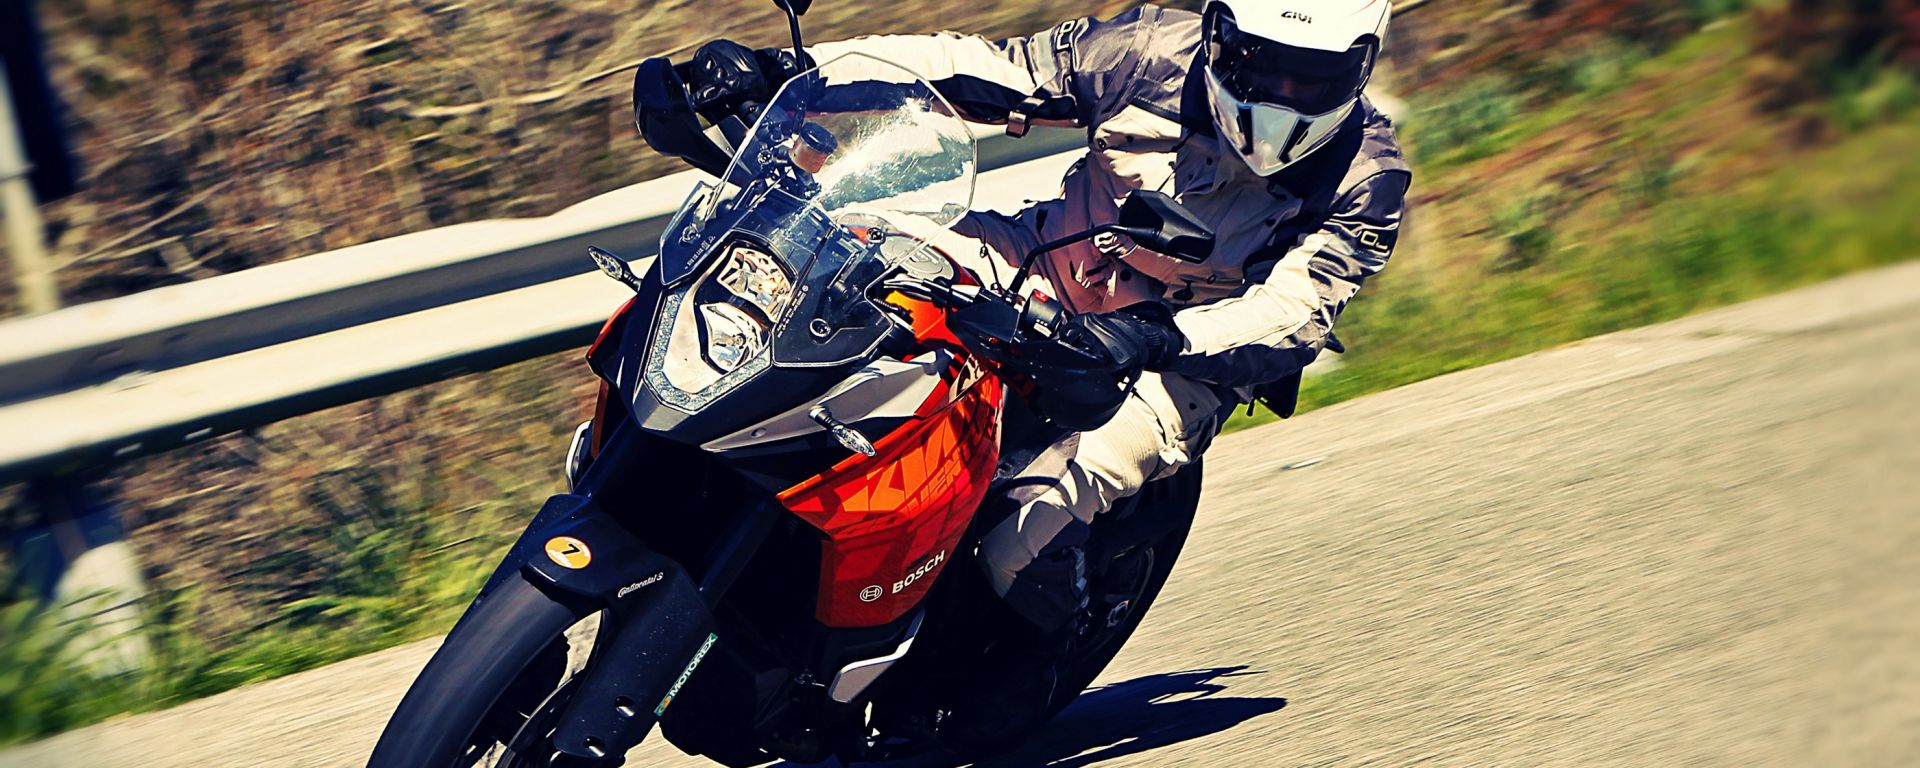 KTM 1190 Adventure MSC